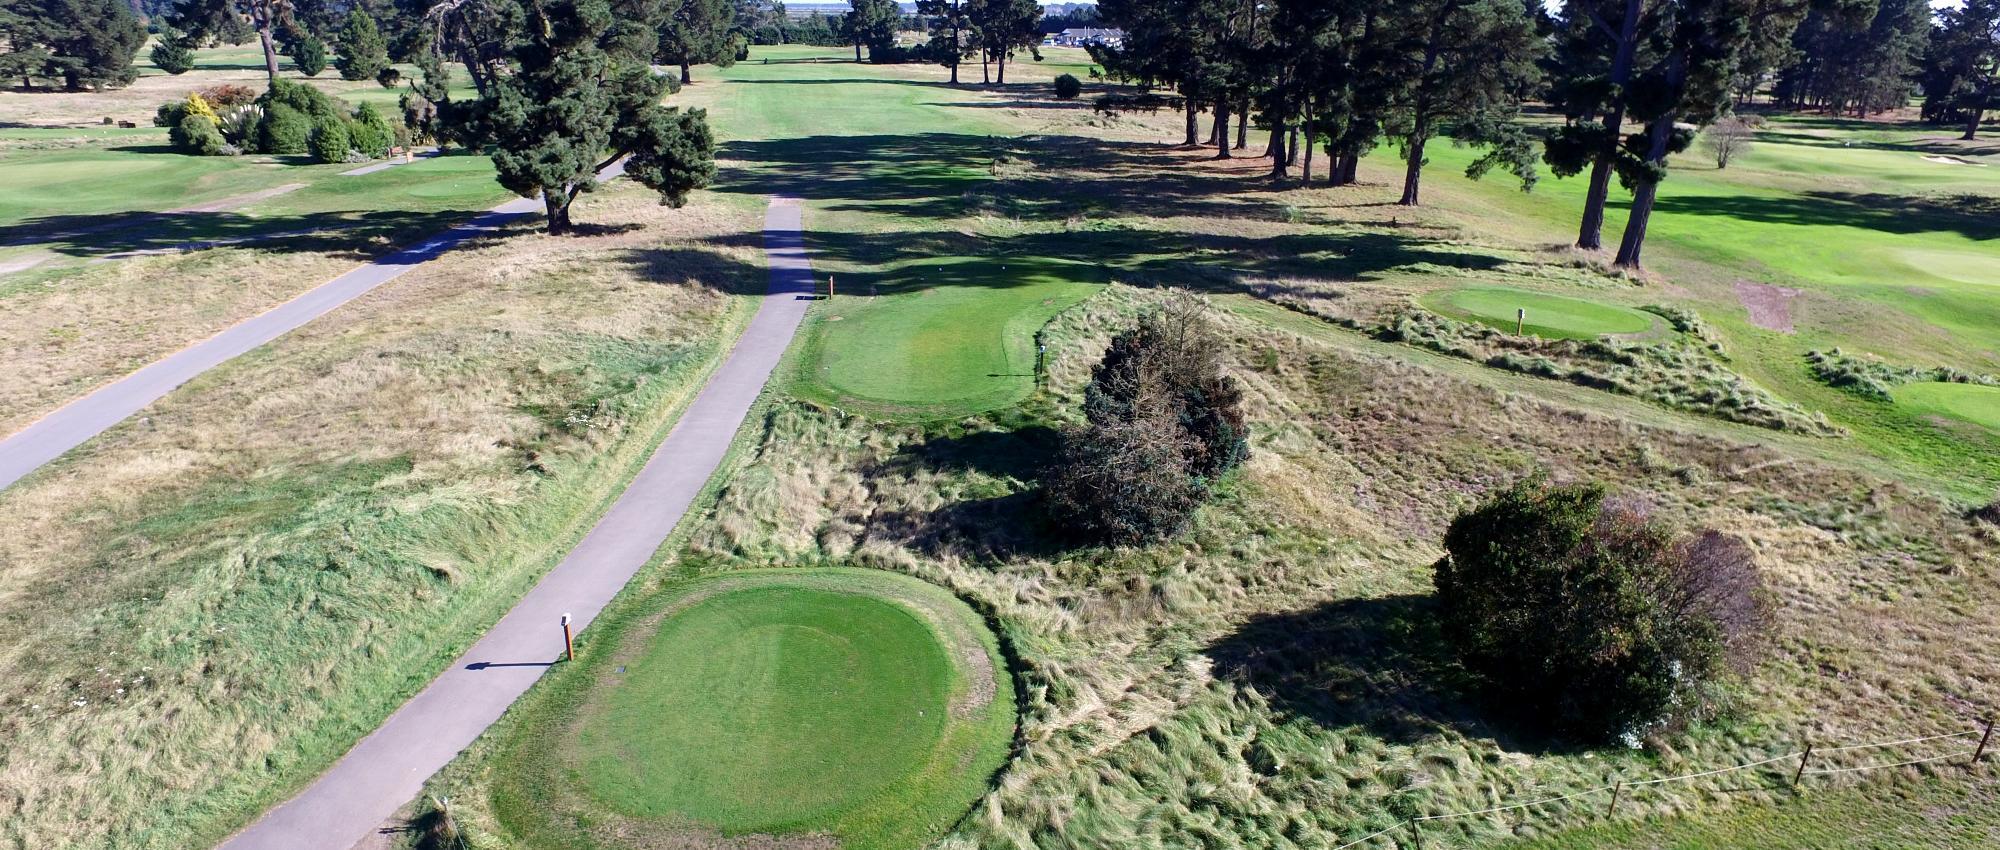 Harewood Golf Club.JPG